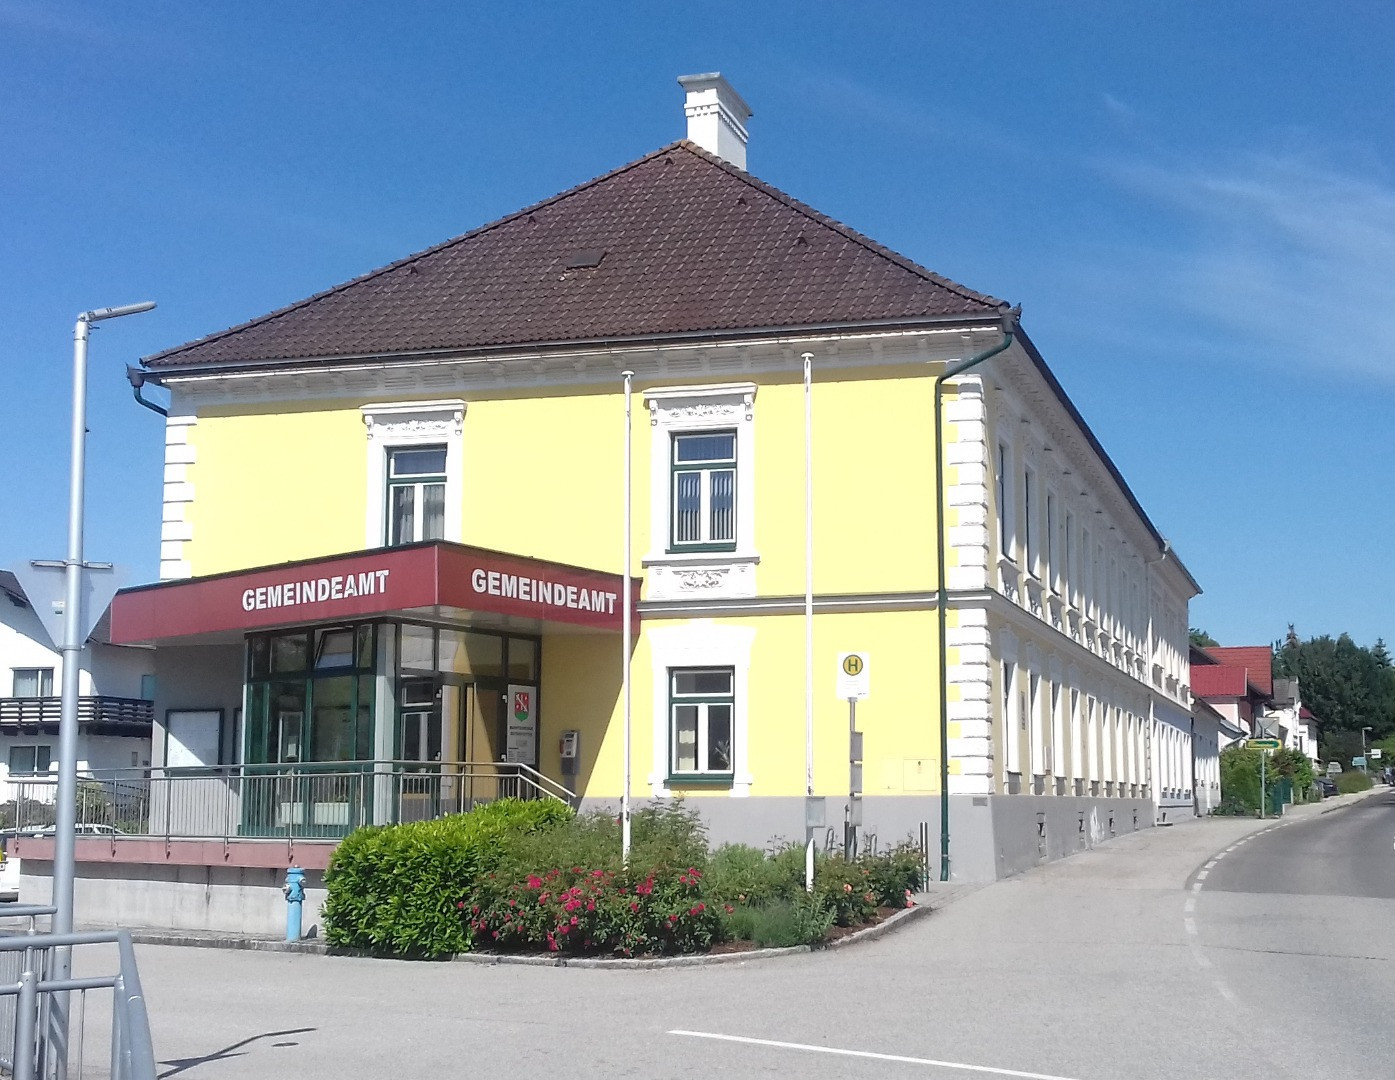 Gemeindeamt2020.jpg